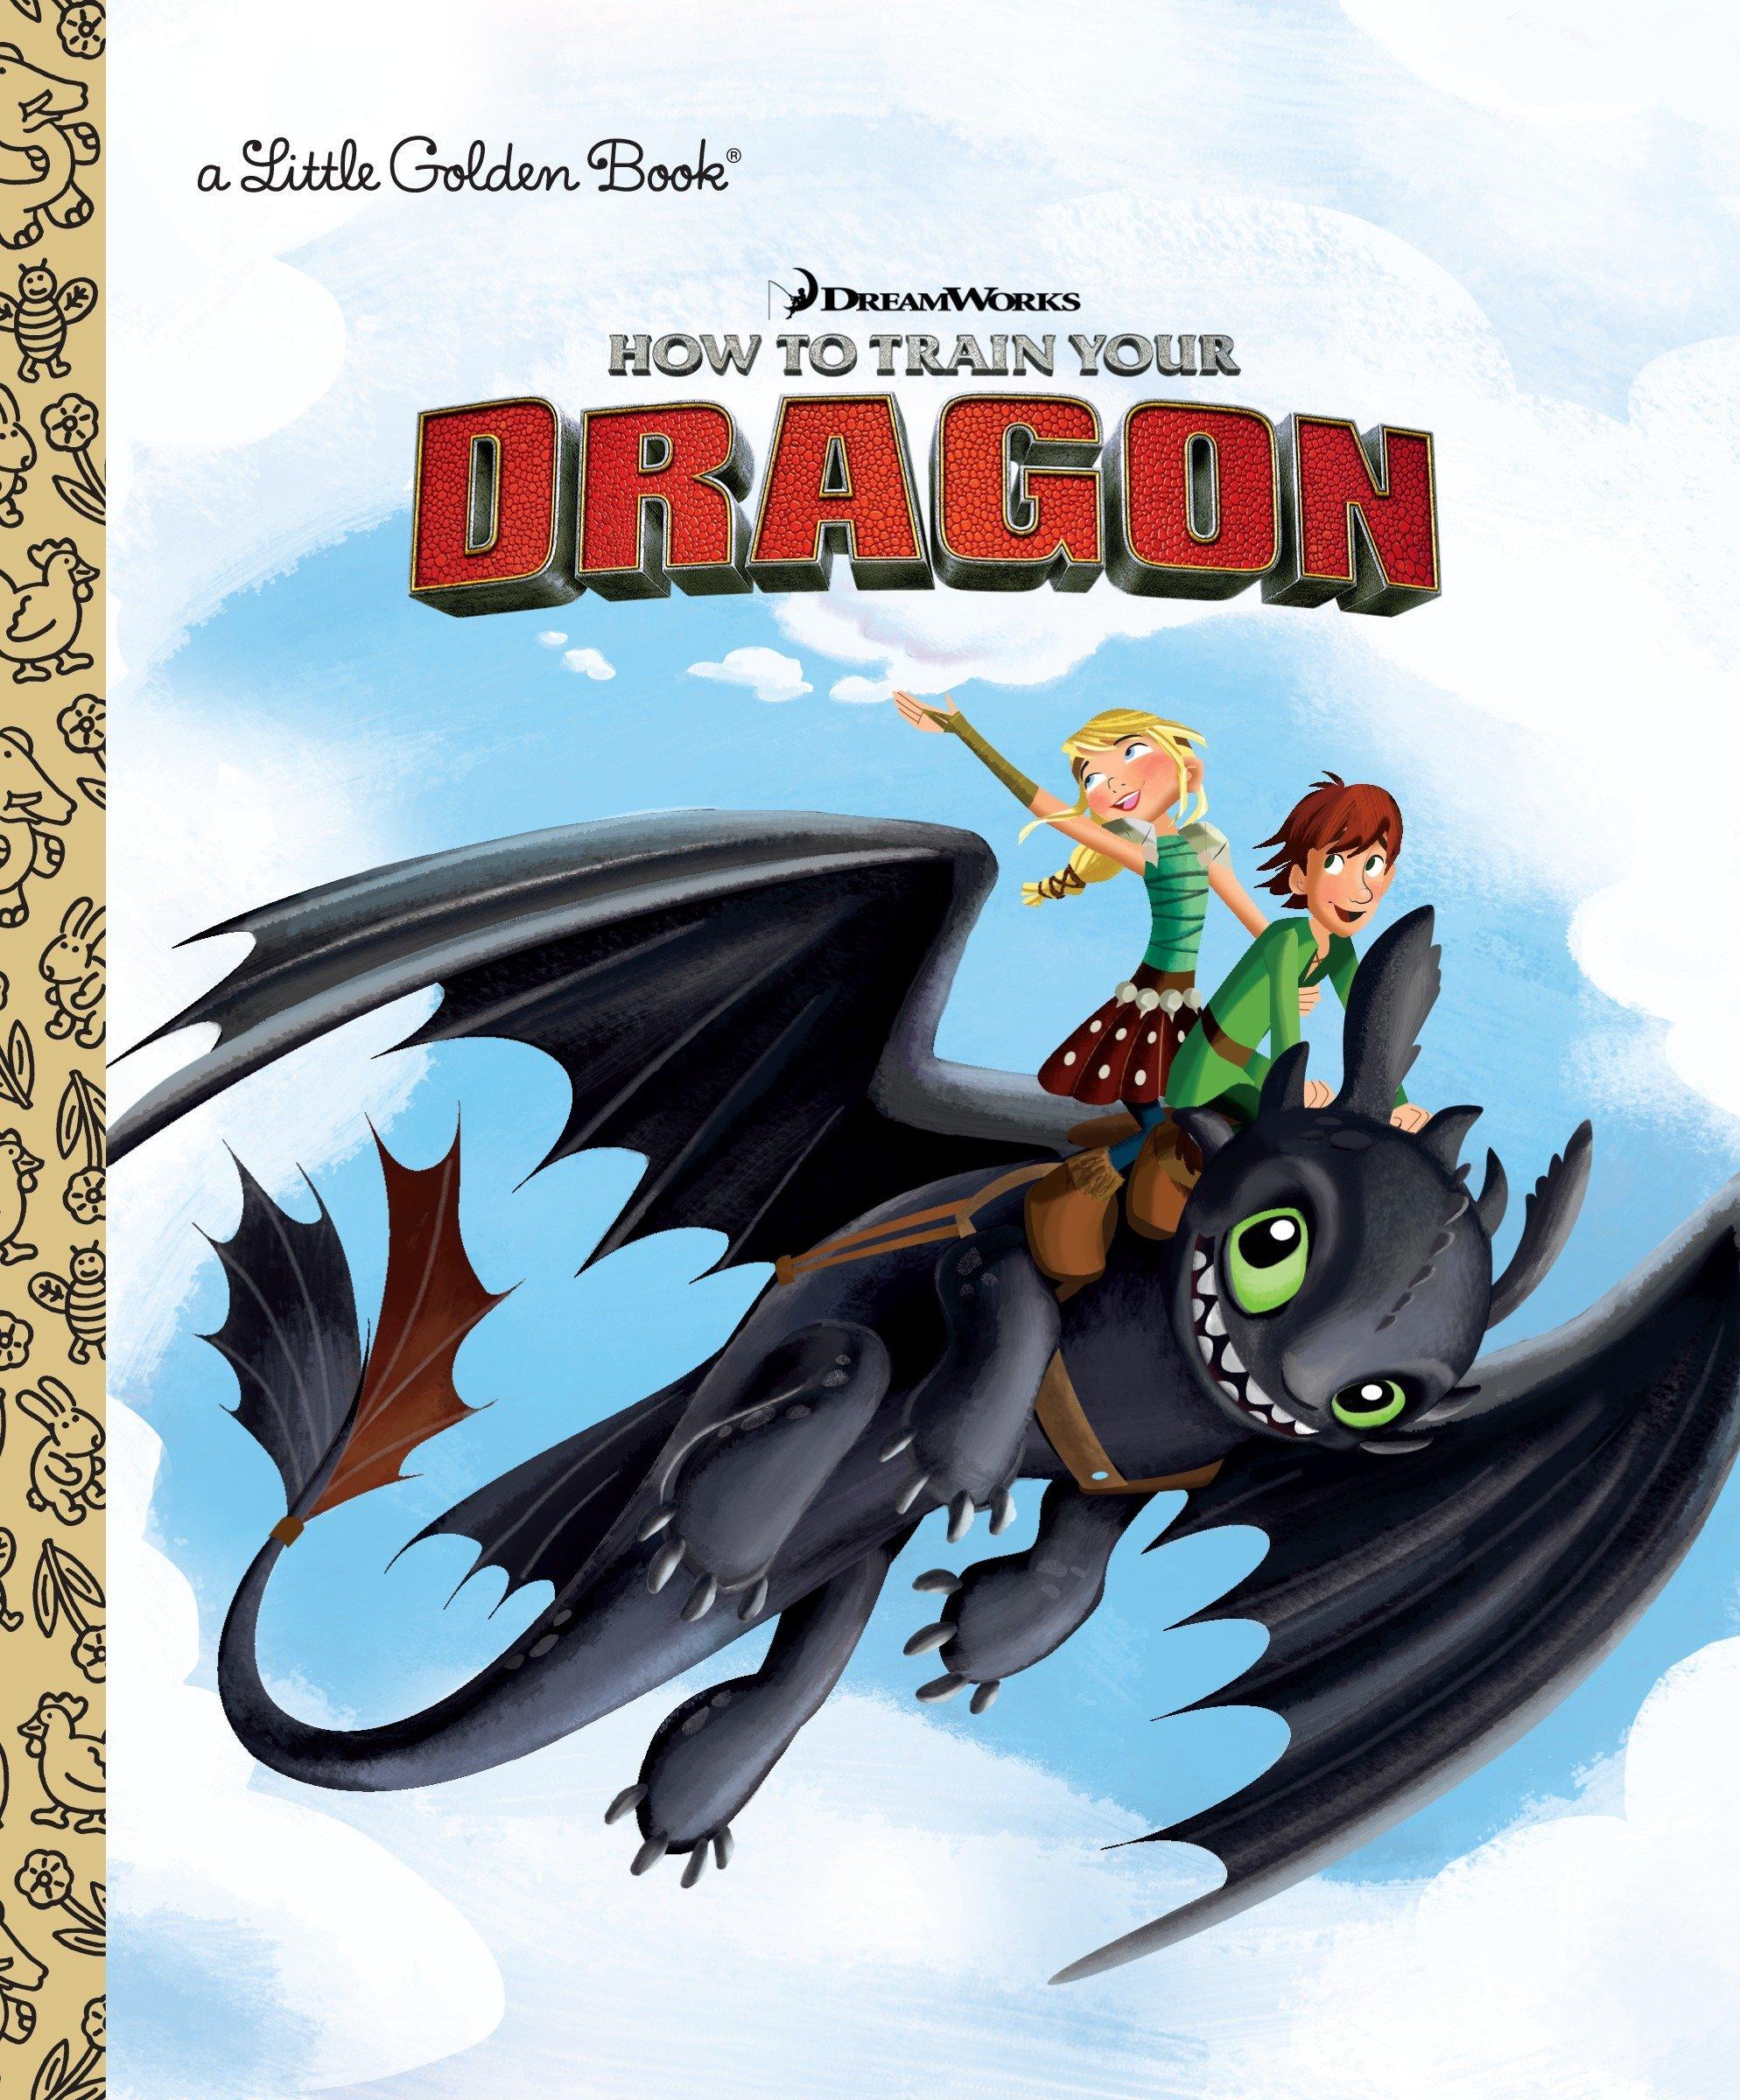 a2883325e5b DreamWorks How to Train Your Dragon (Little Golden Book)  Devra ...